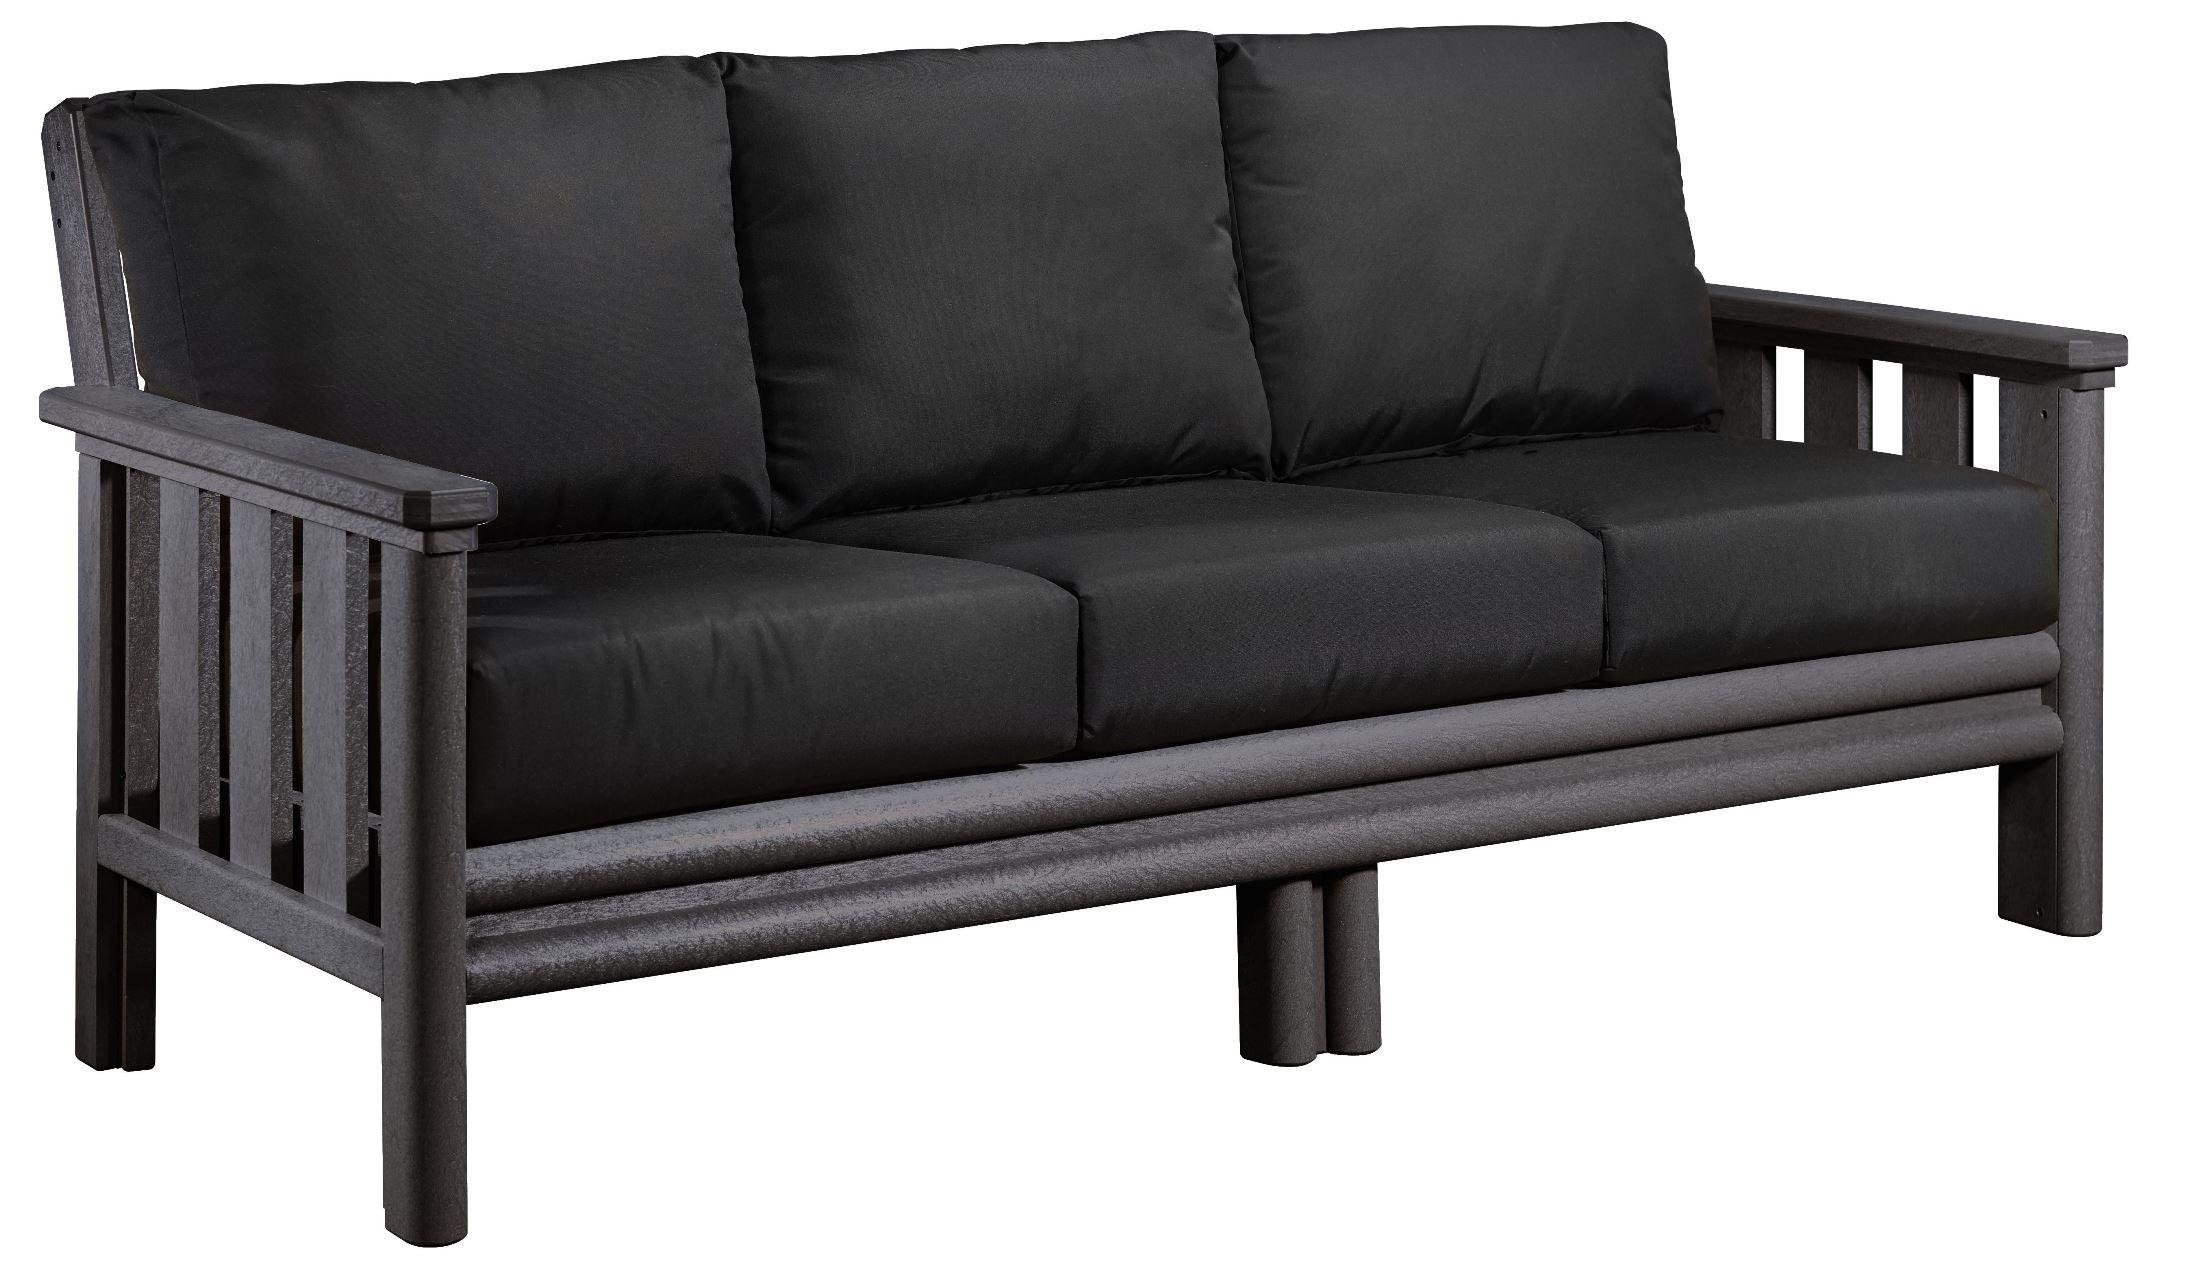 Stratford Slate Gray Sofa With Black Sunbrella Cushions